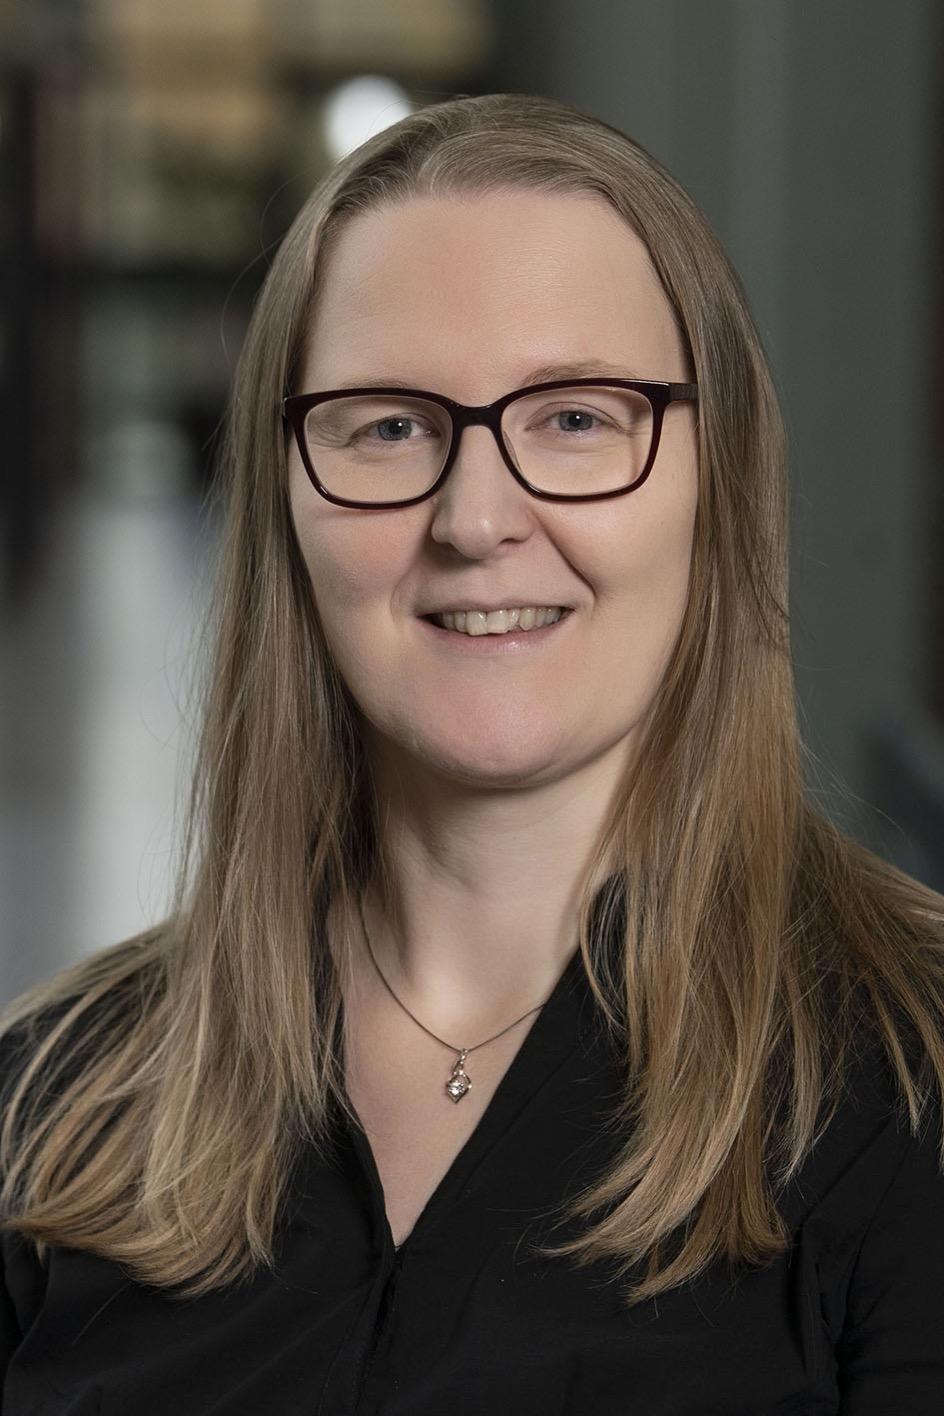 Katja Hose